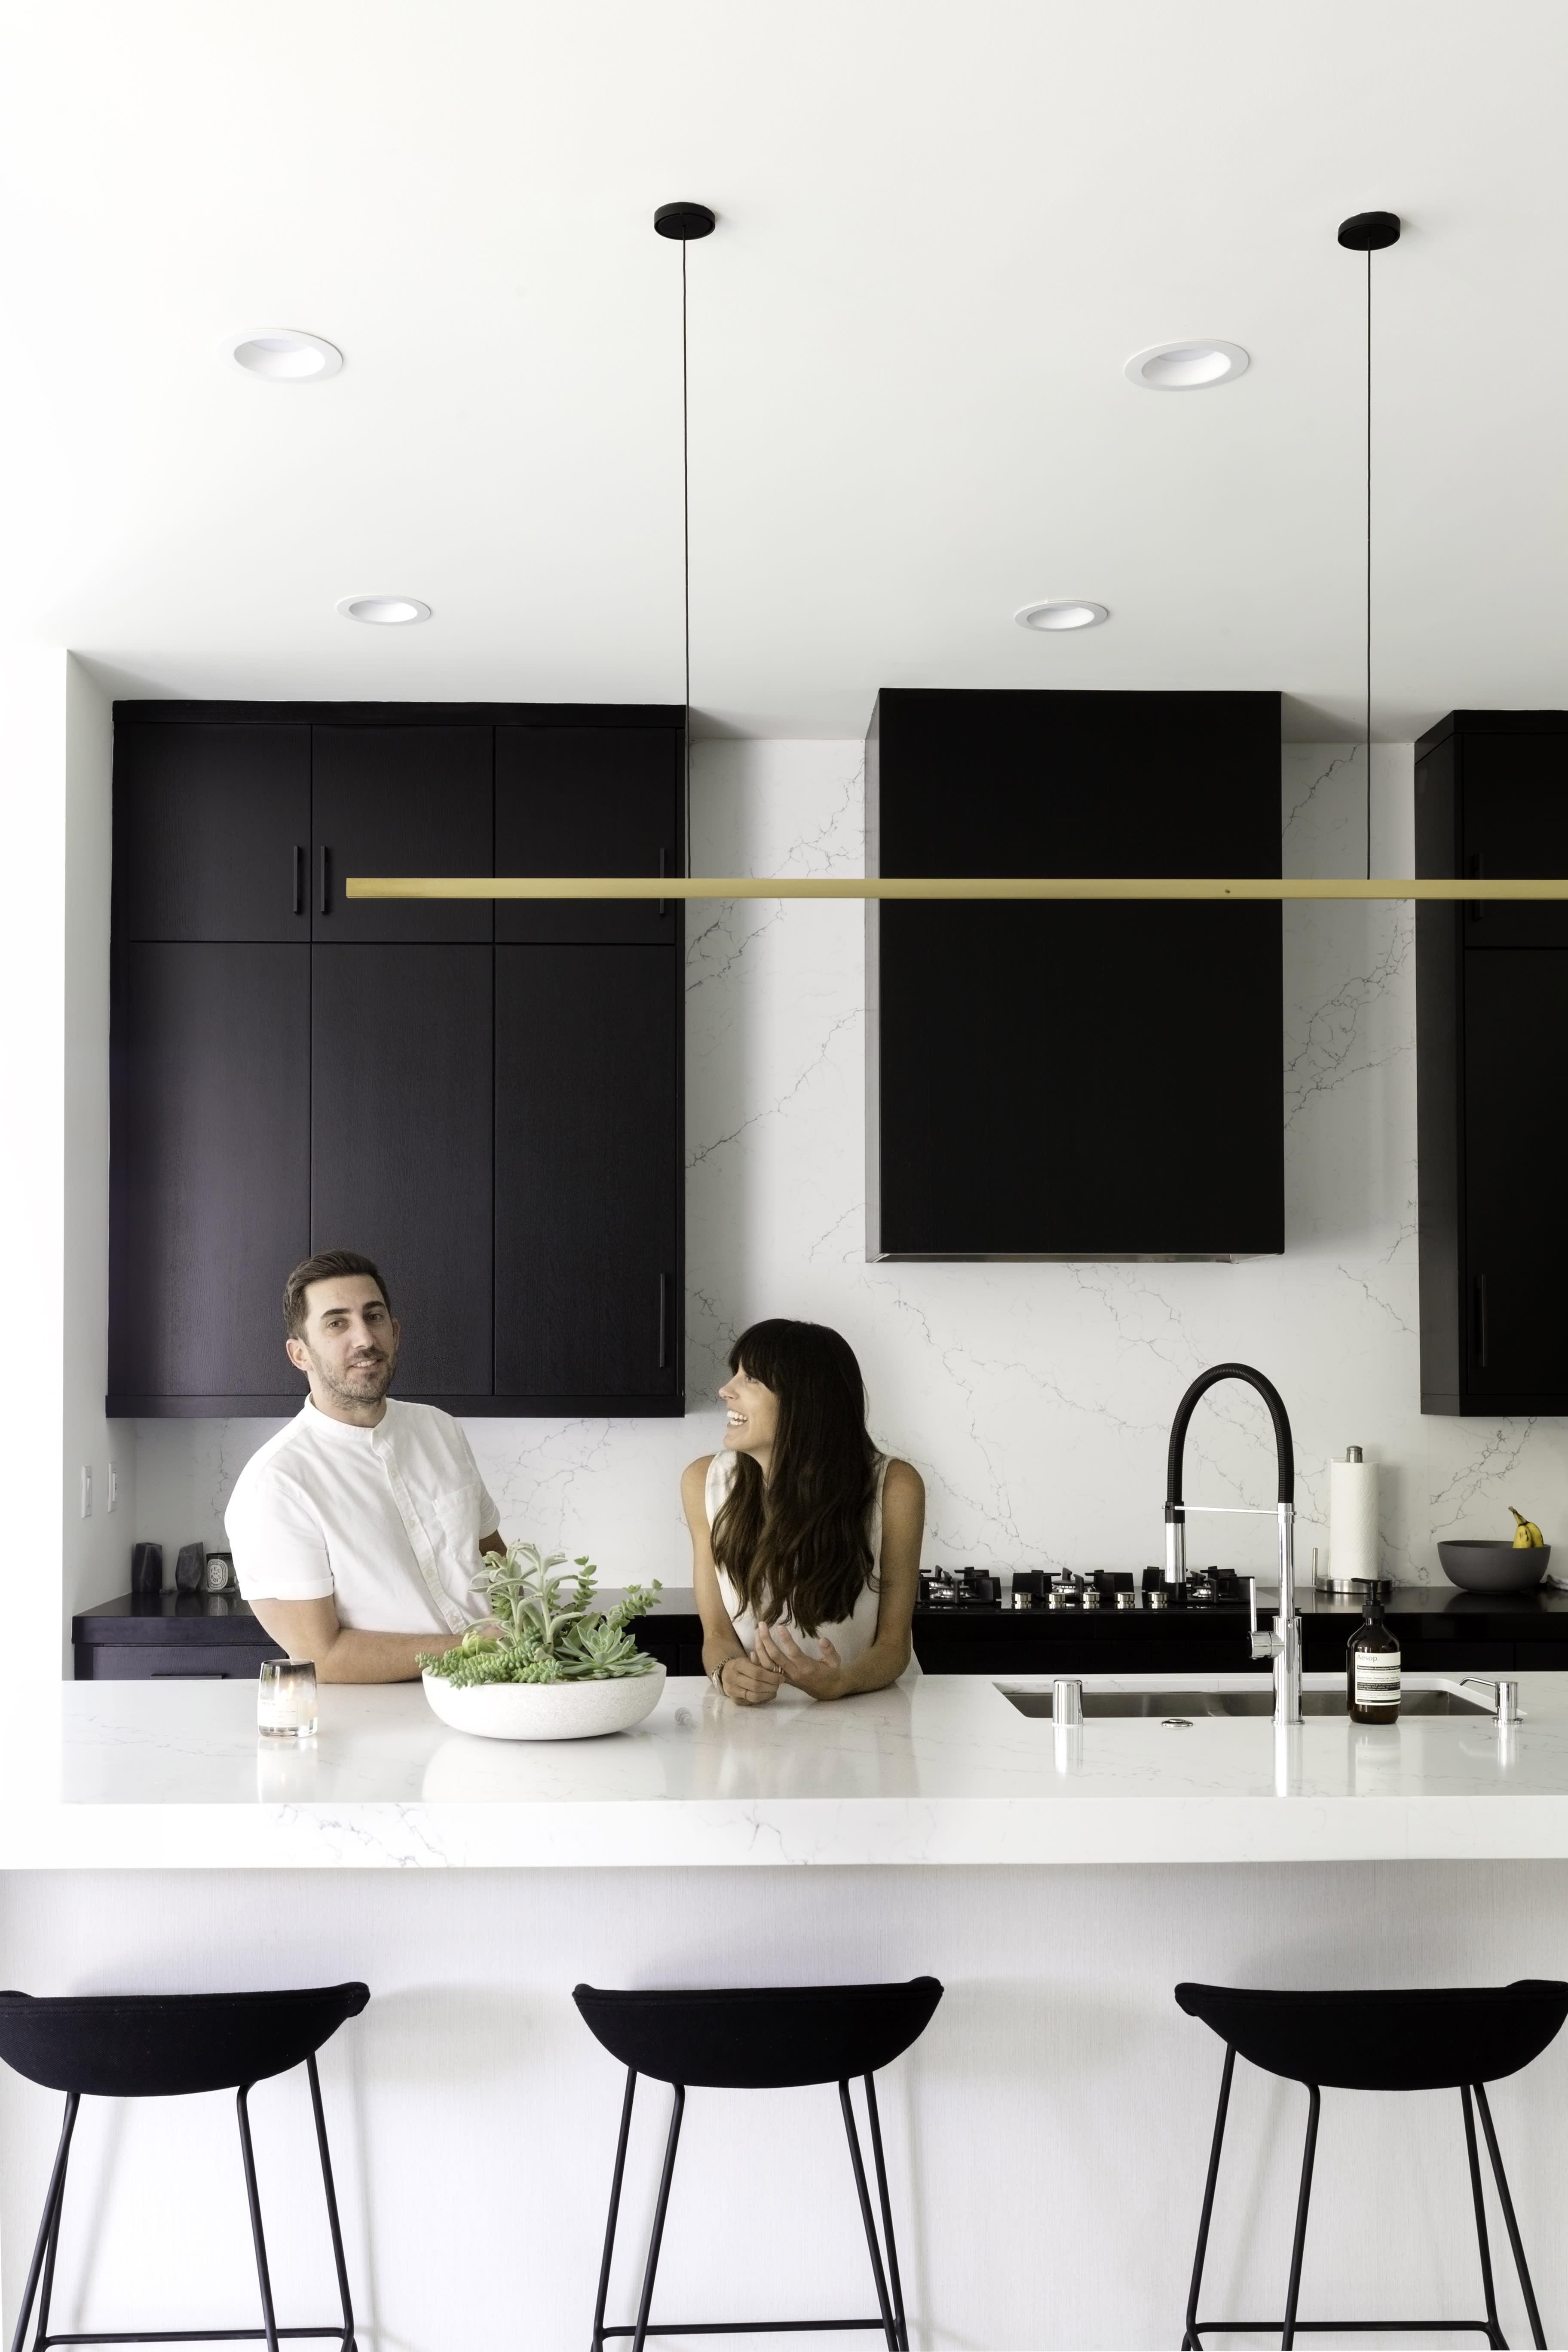 20 Stylish Black & White Kitchens   How to Use Black & White in ...